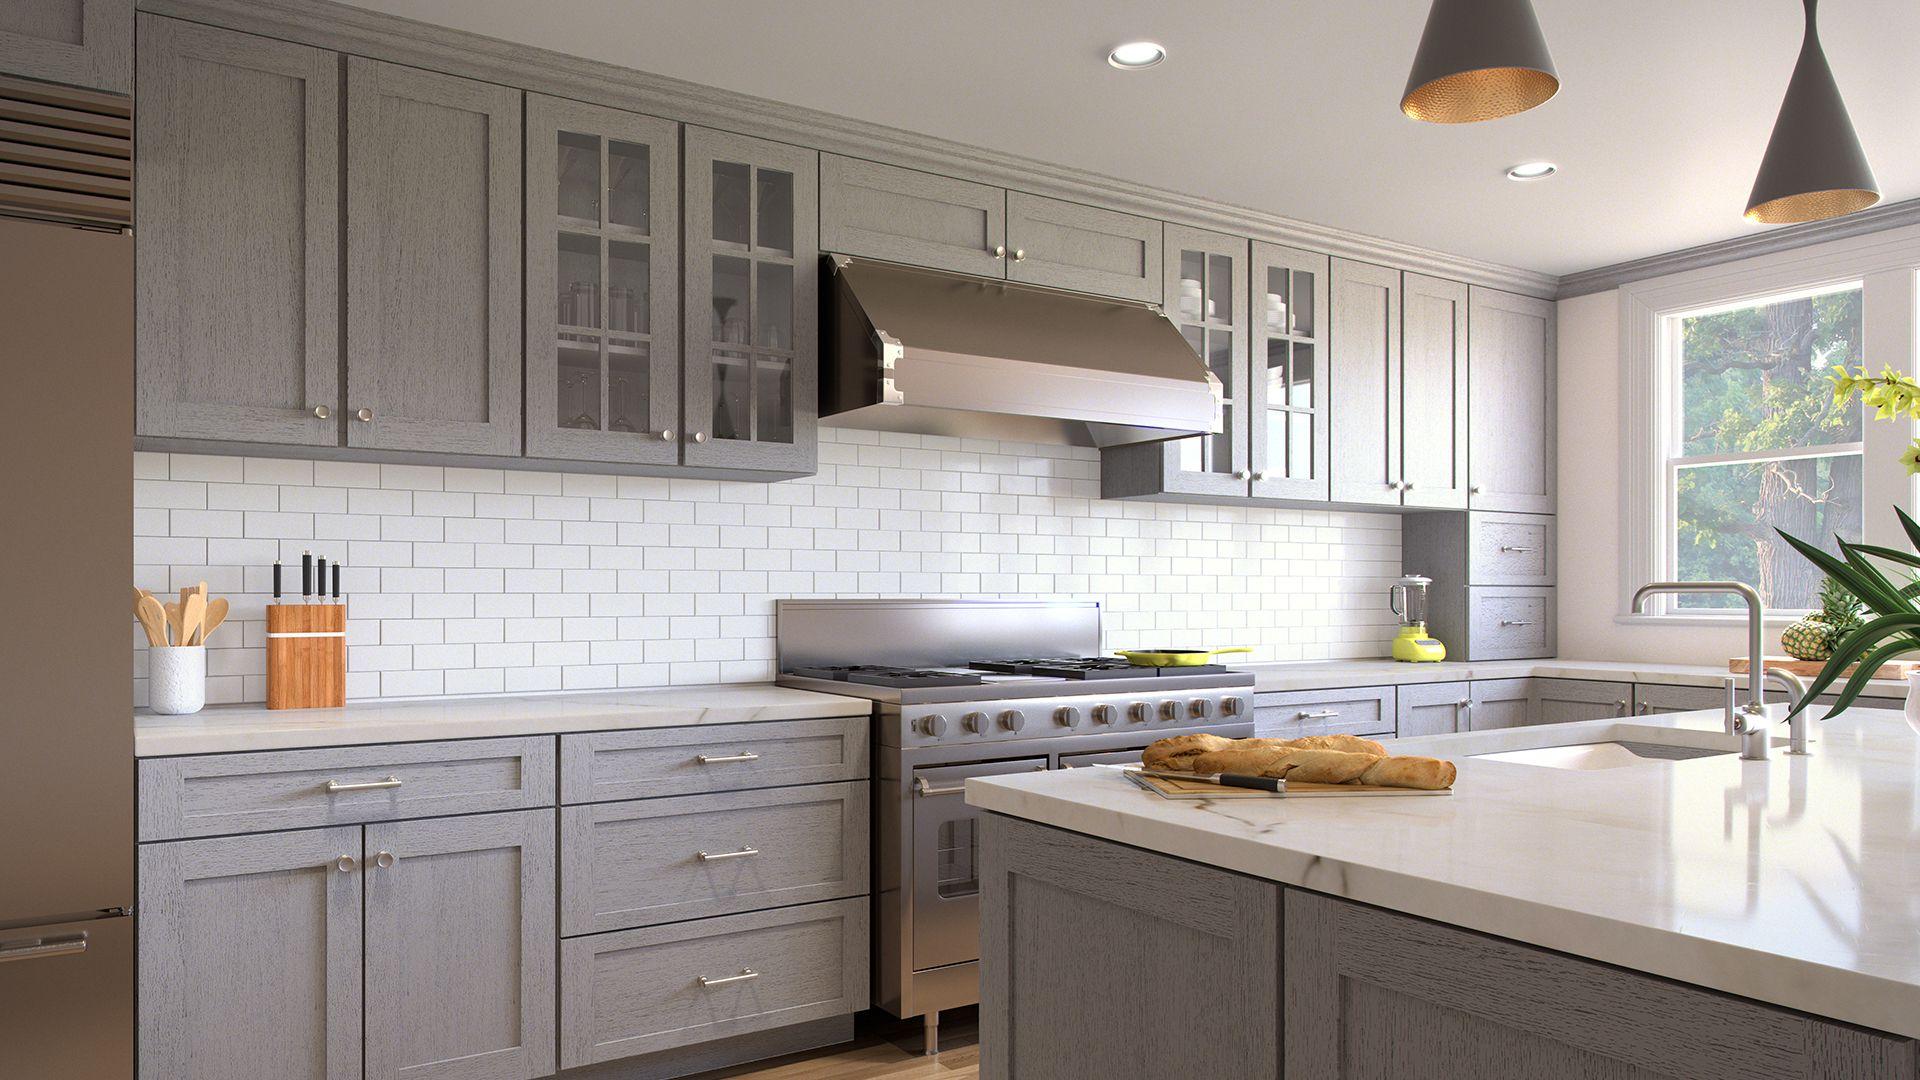 Forevermark Nova Light Grey Waverly Cabinets In 2020 Stained Kitchen Cabinets Kitchen Cabinetry Design Custom Kitchen Cabinets